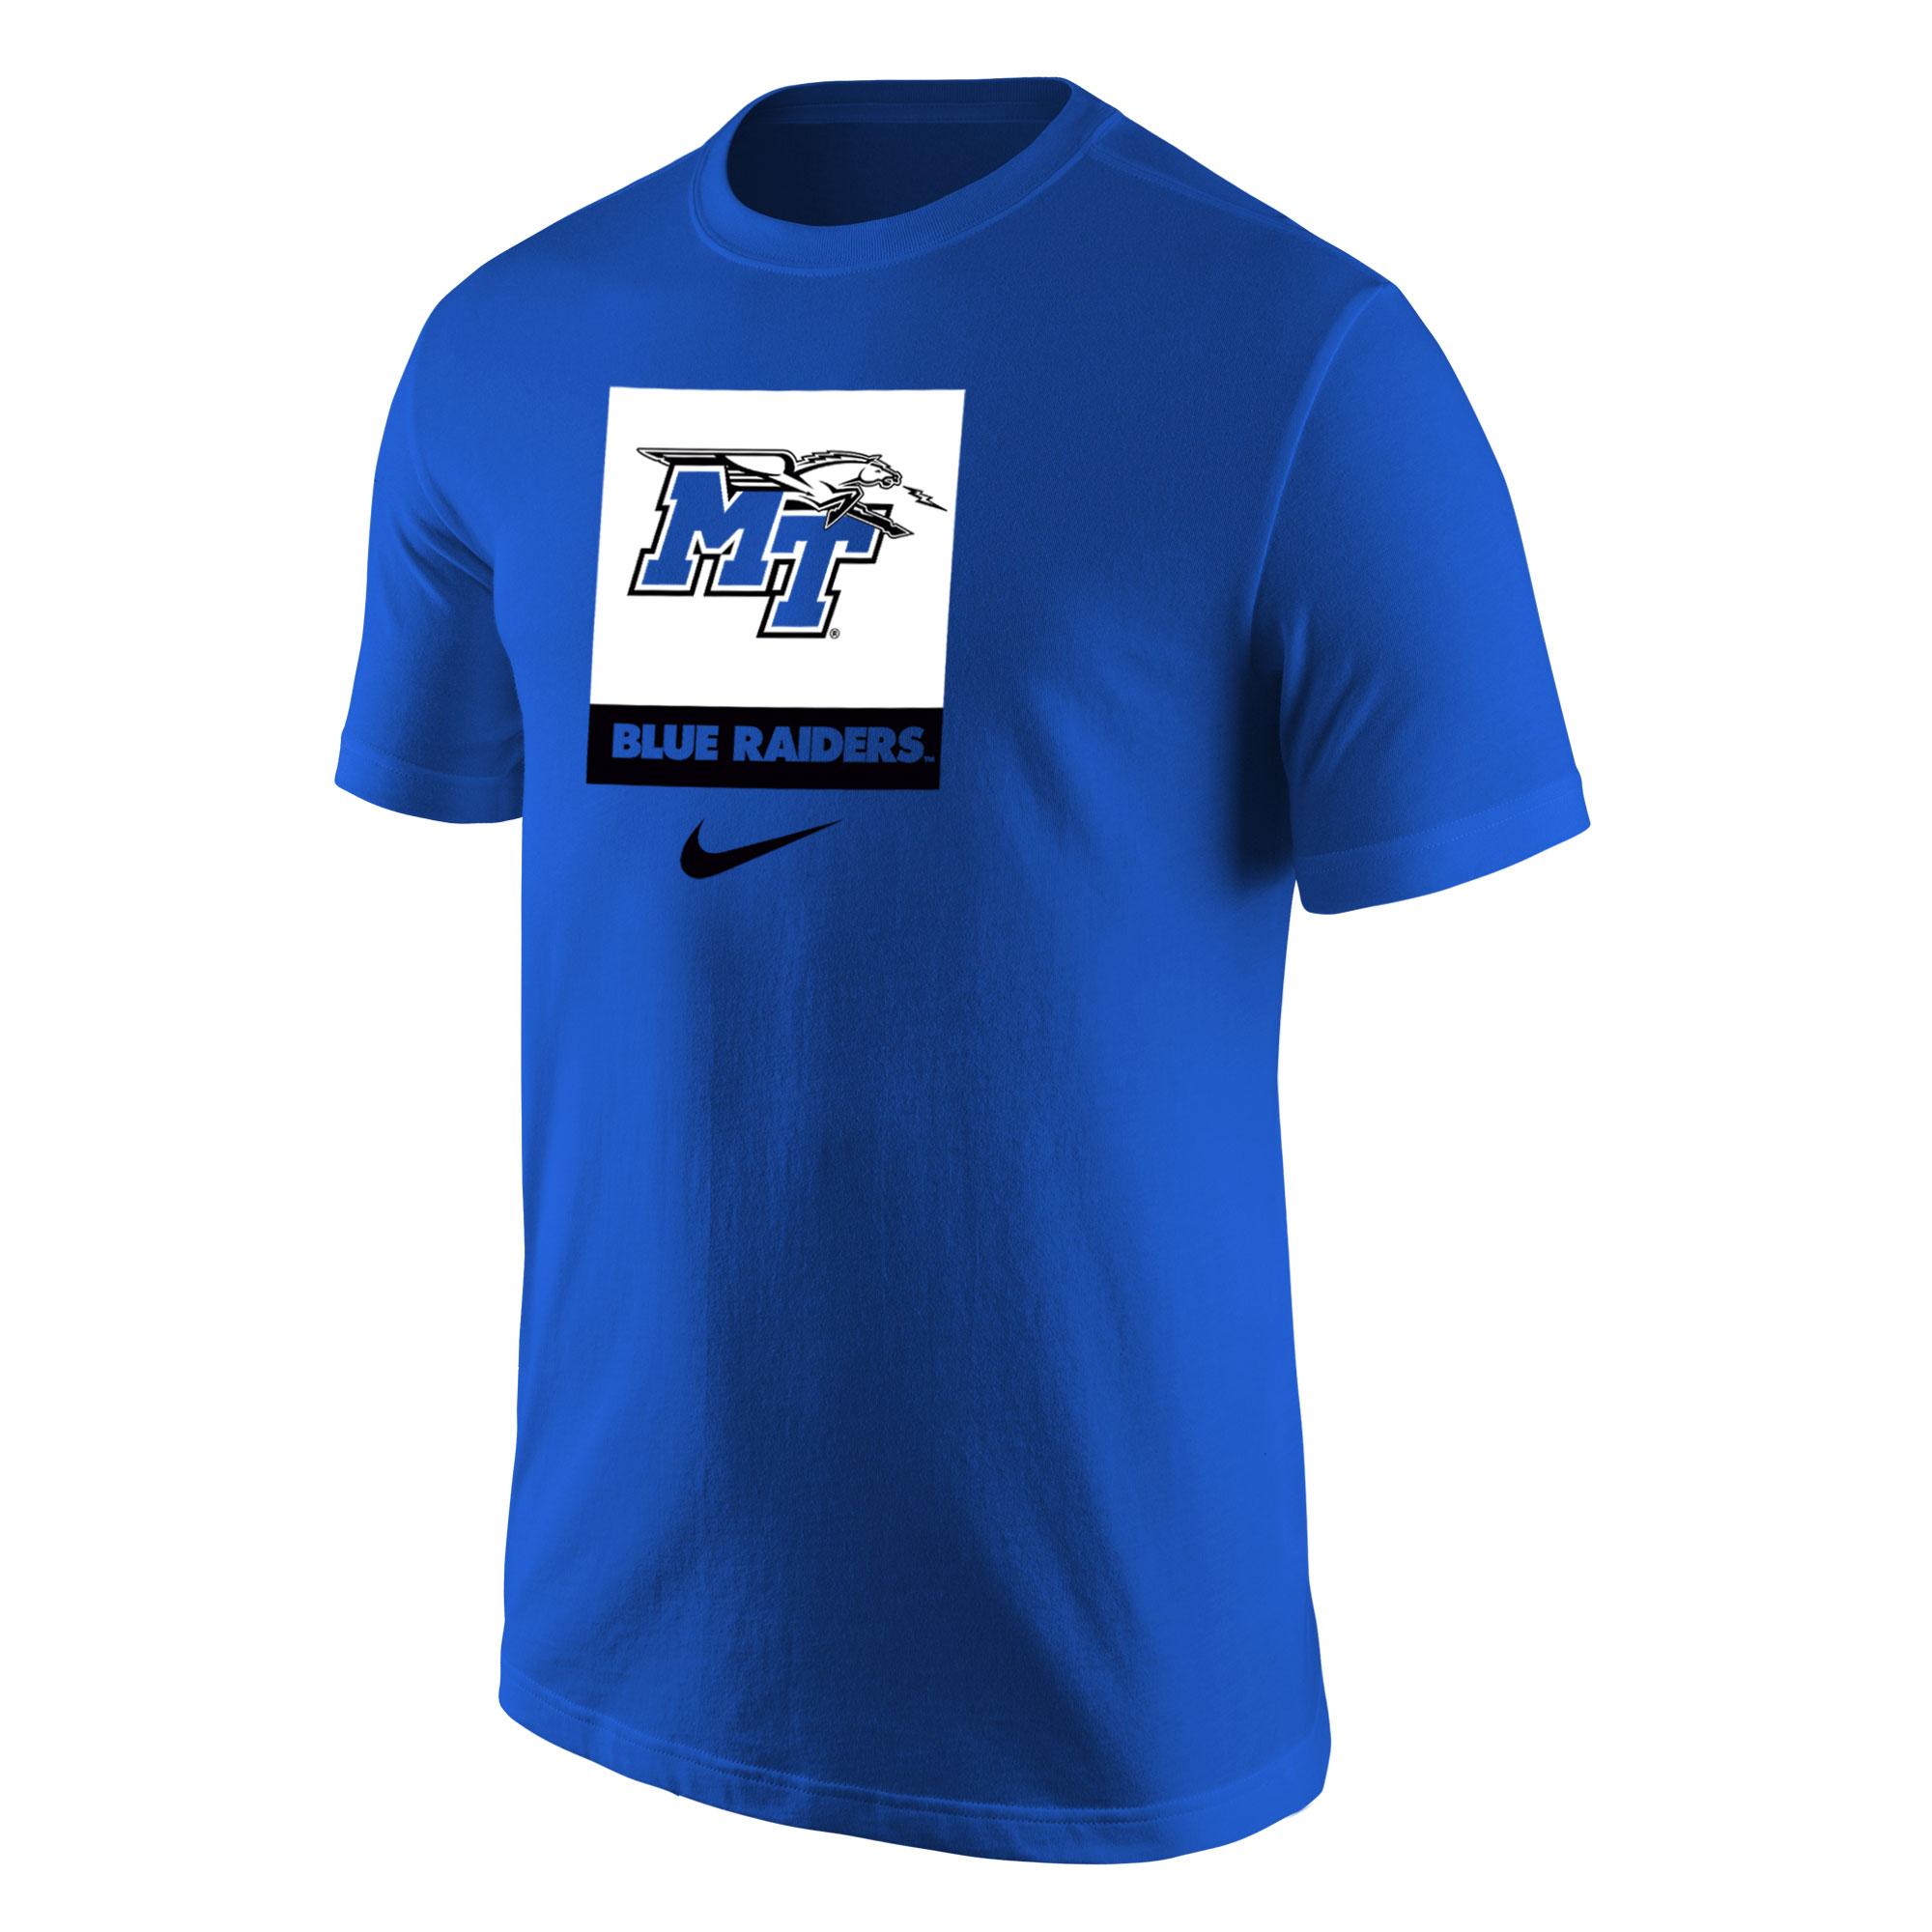 MT Logo w/ Lightning Blue Raiders Core Nike® Shirt